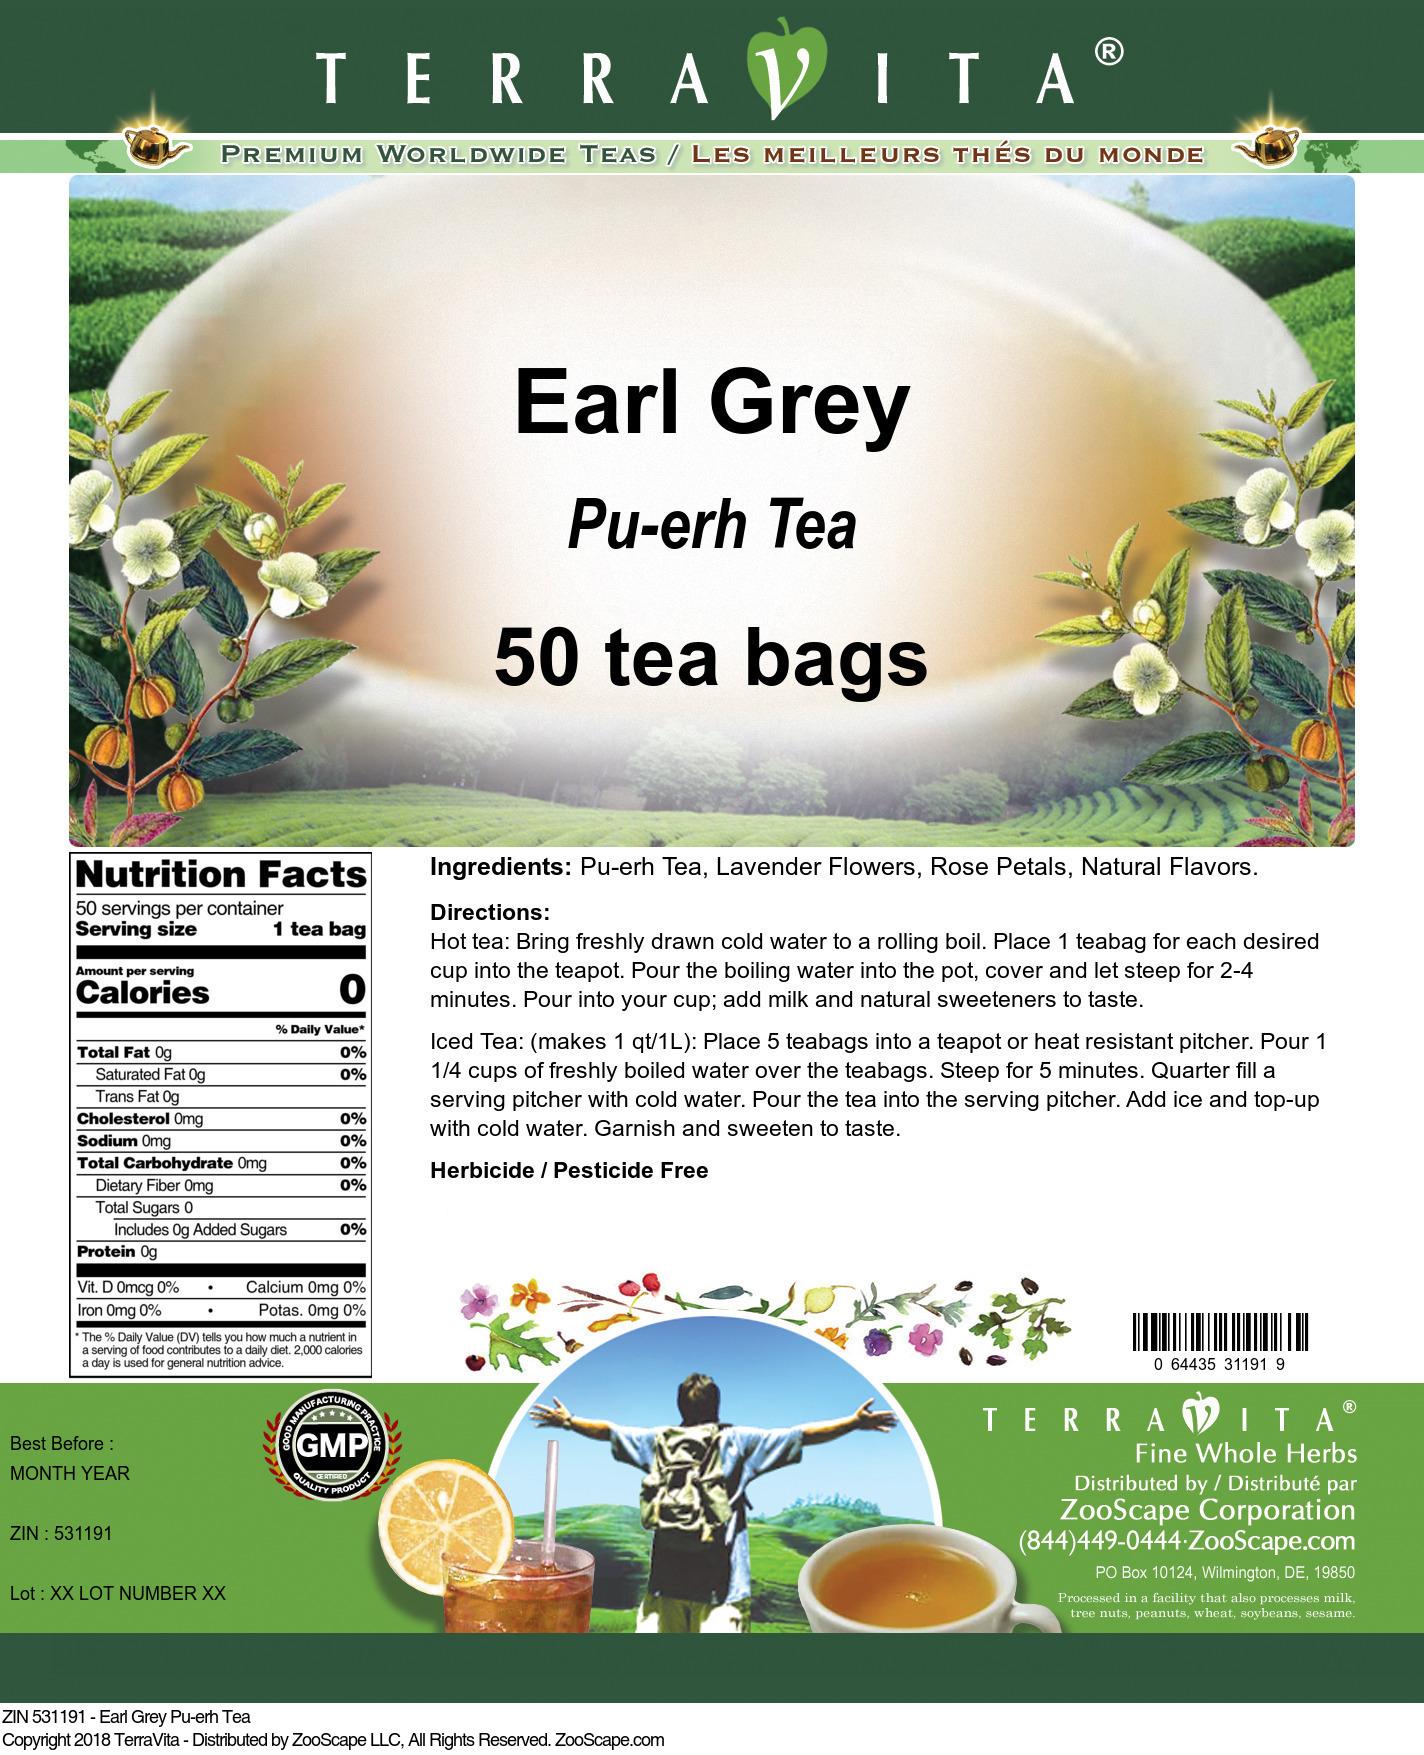 Earl Grey Pu-erh Tea